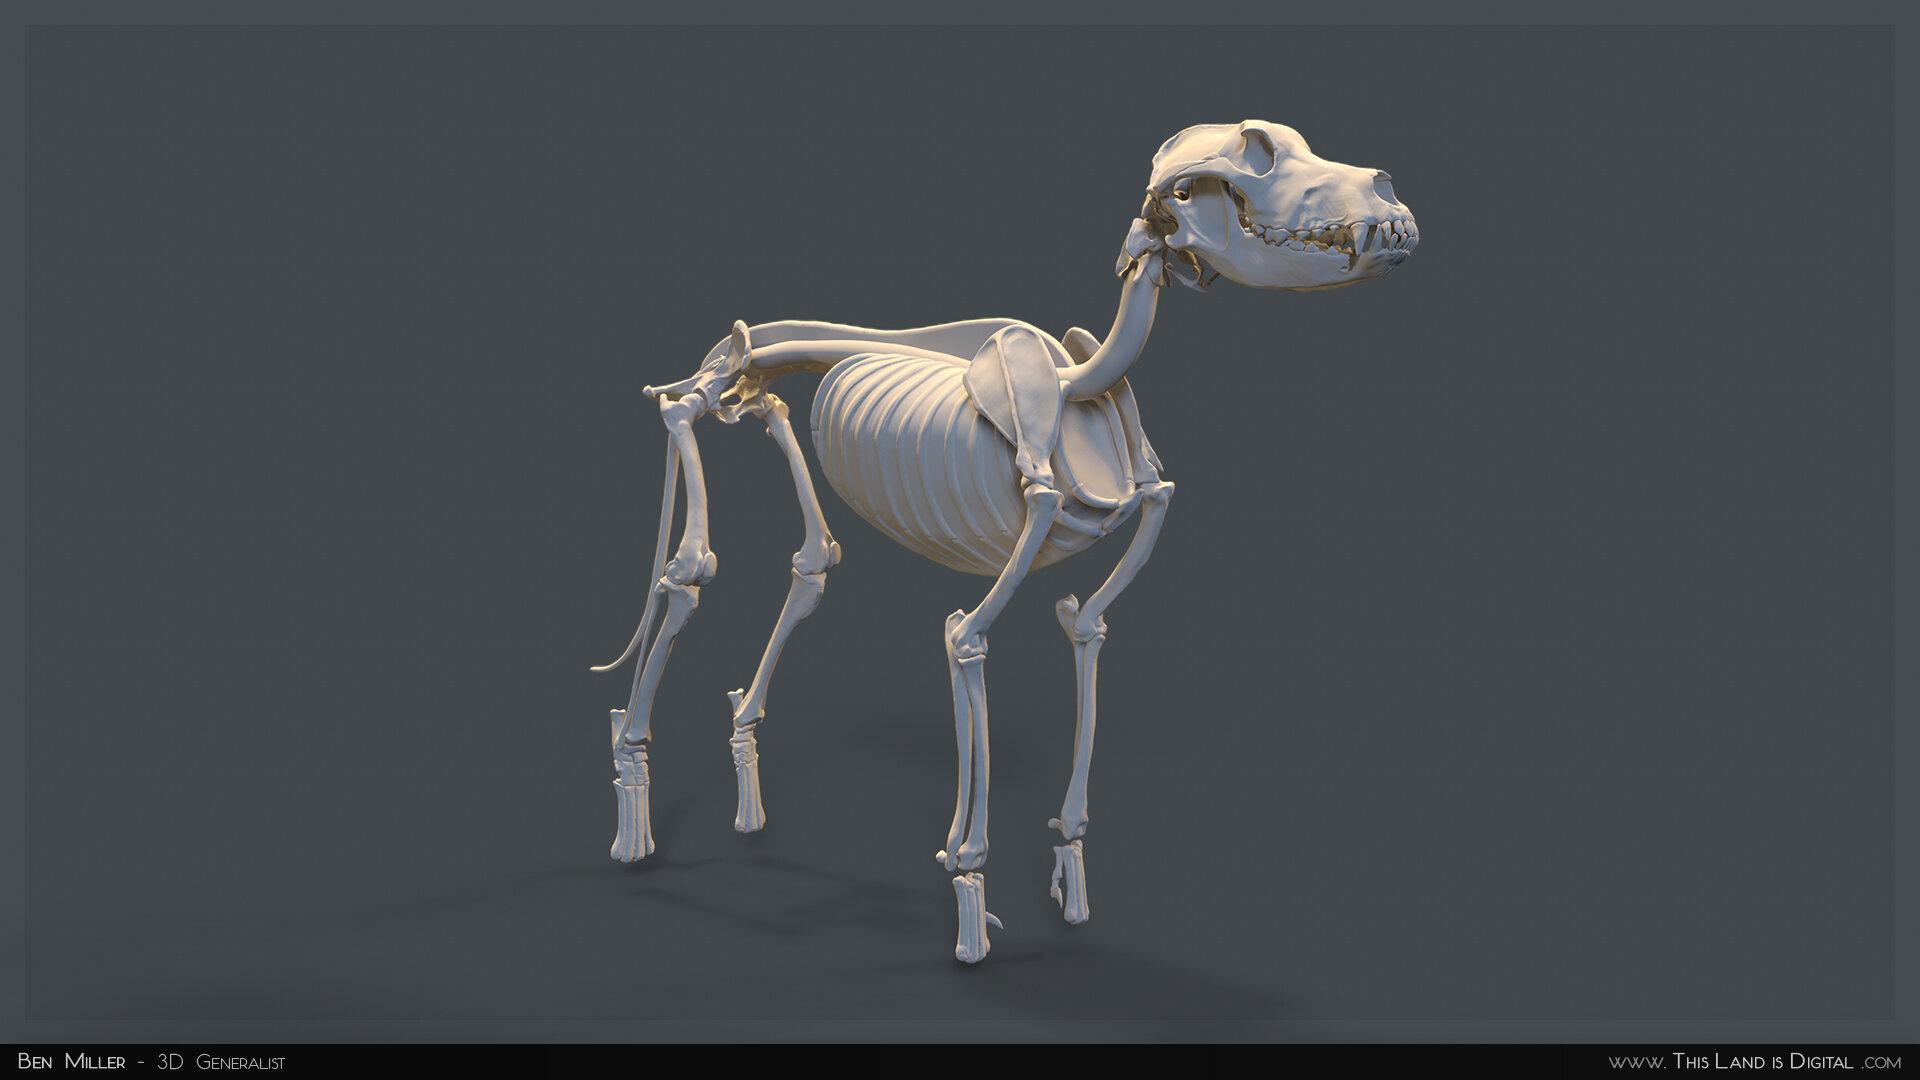 TLiD_BenMiller_AnatomyDogStudy-Skeleton_01.jpg